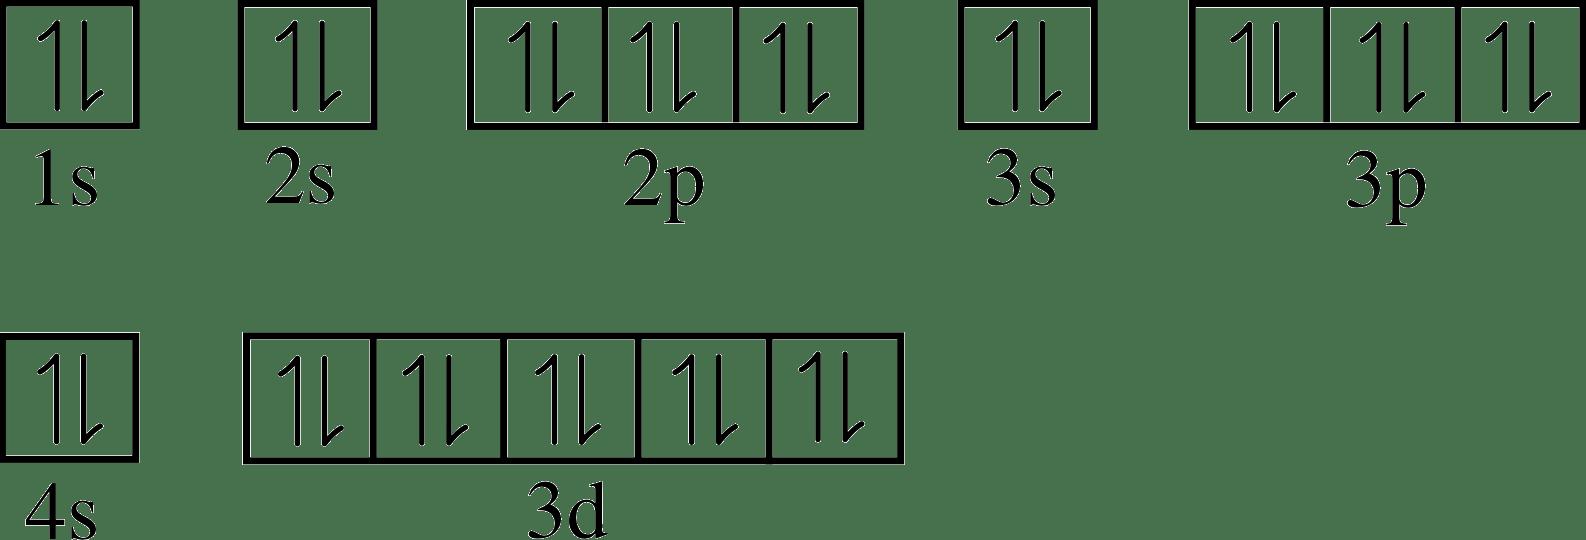 Argon: Orbital Notation For Argon